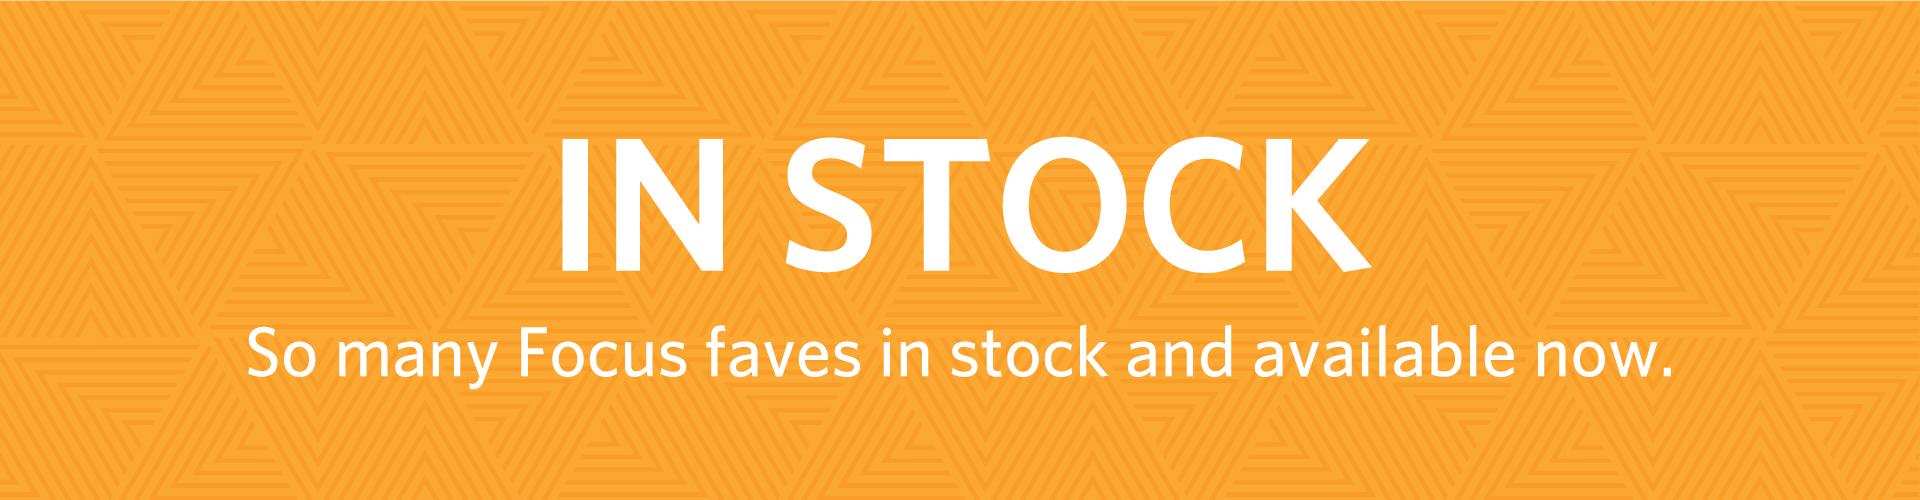 in-stock-category-banner-02.jpg